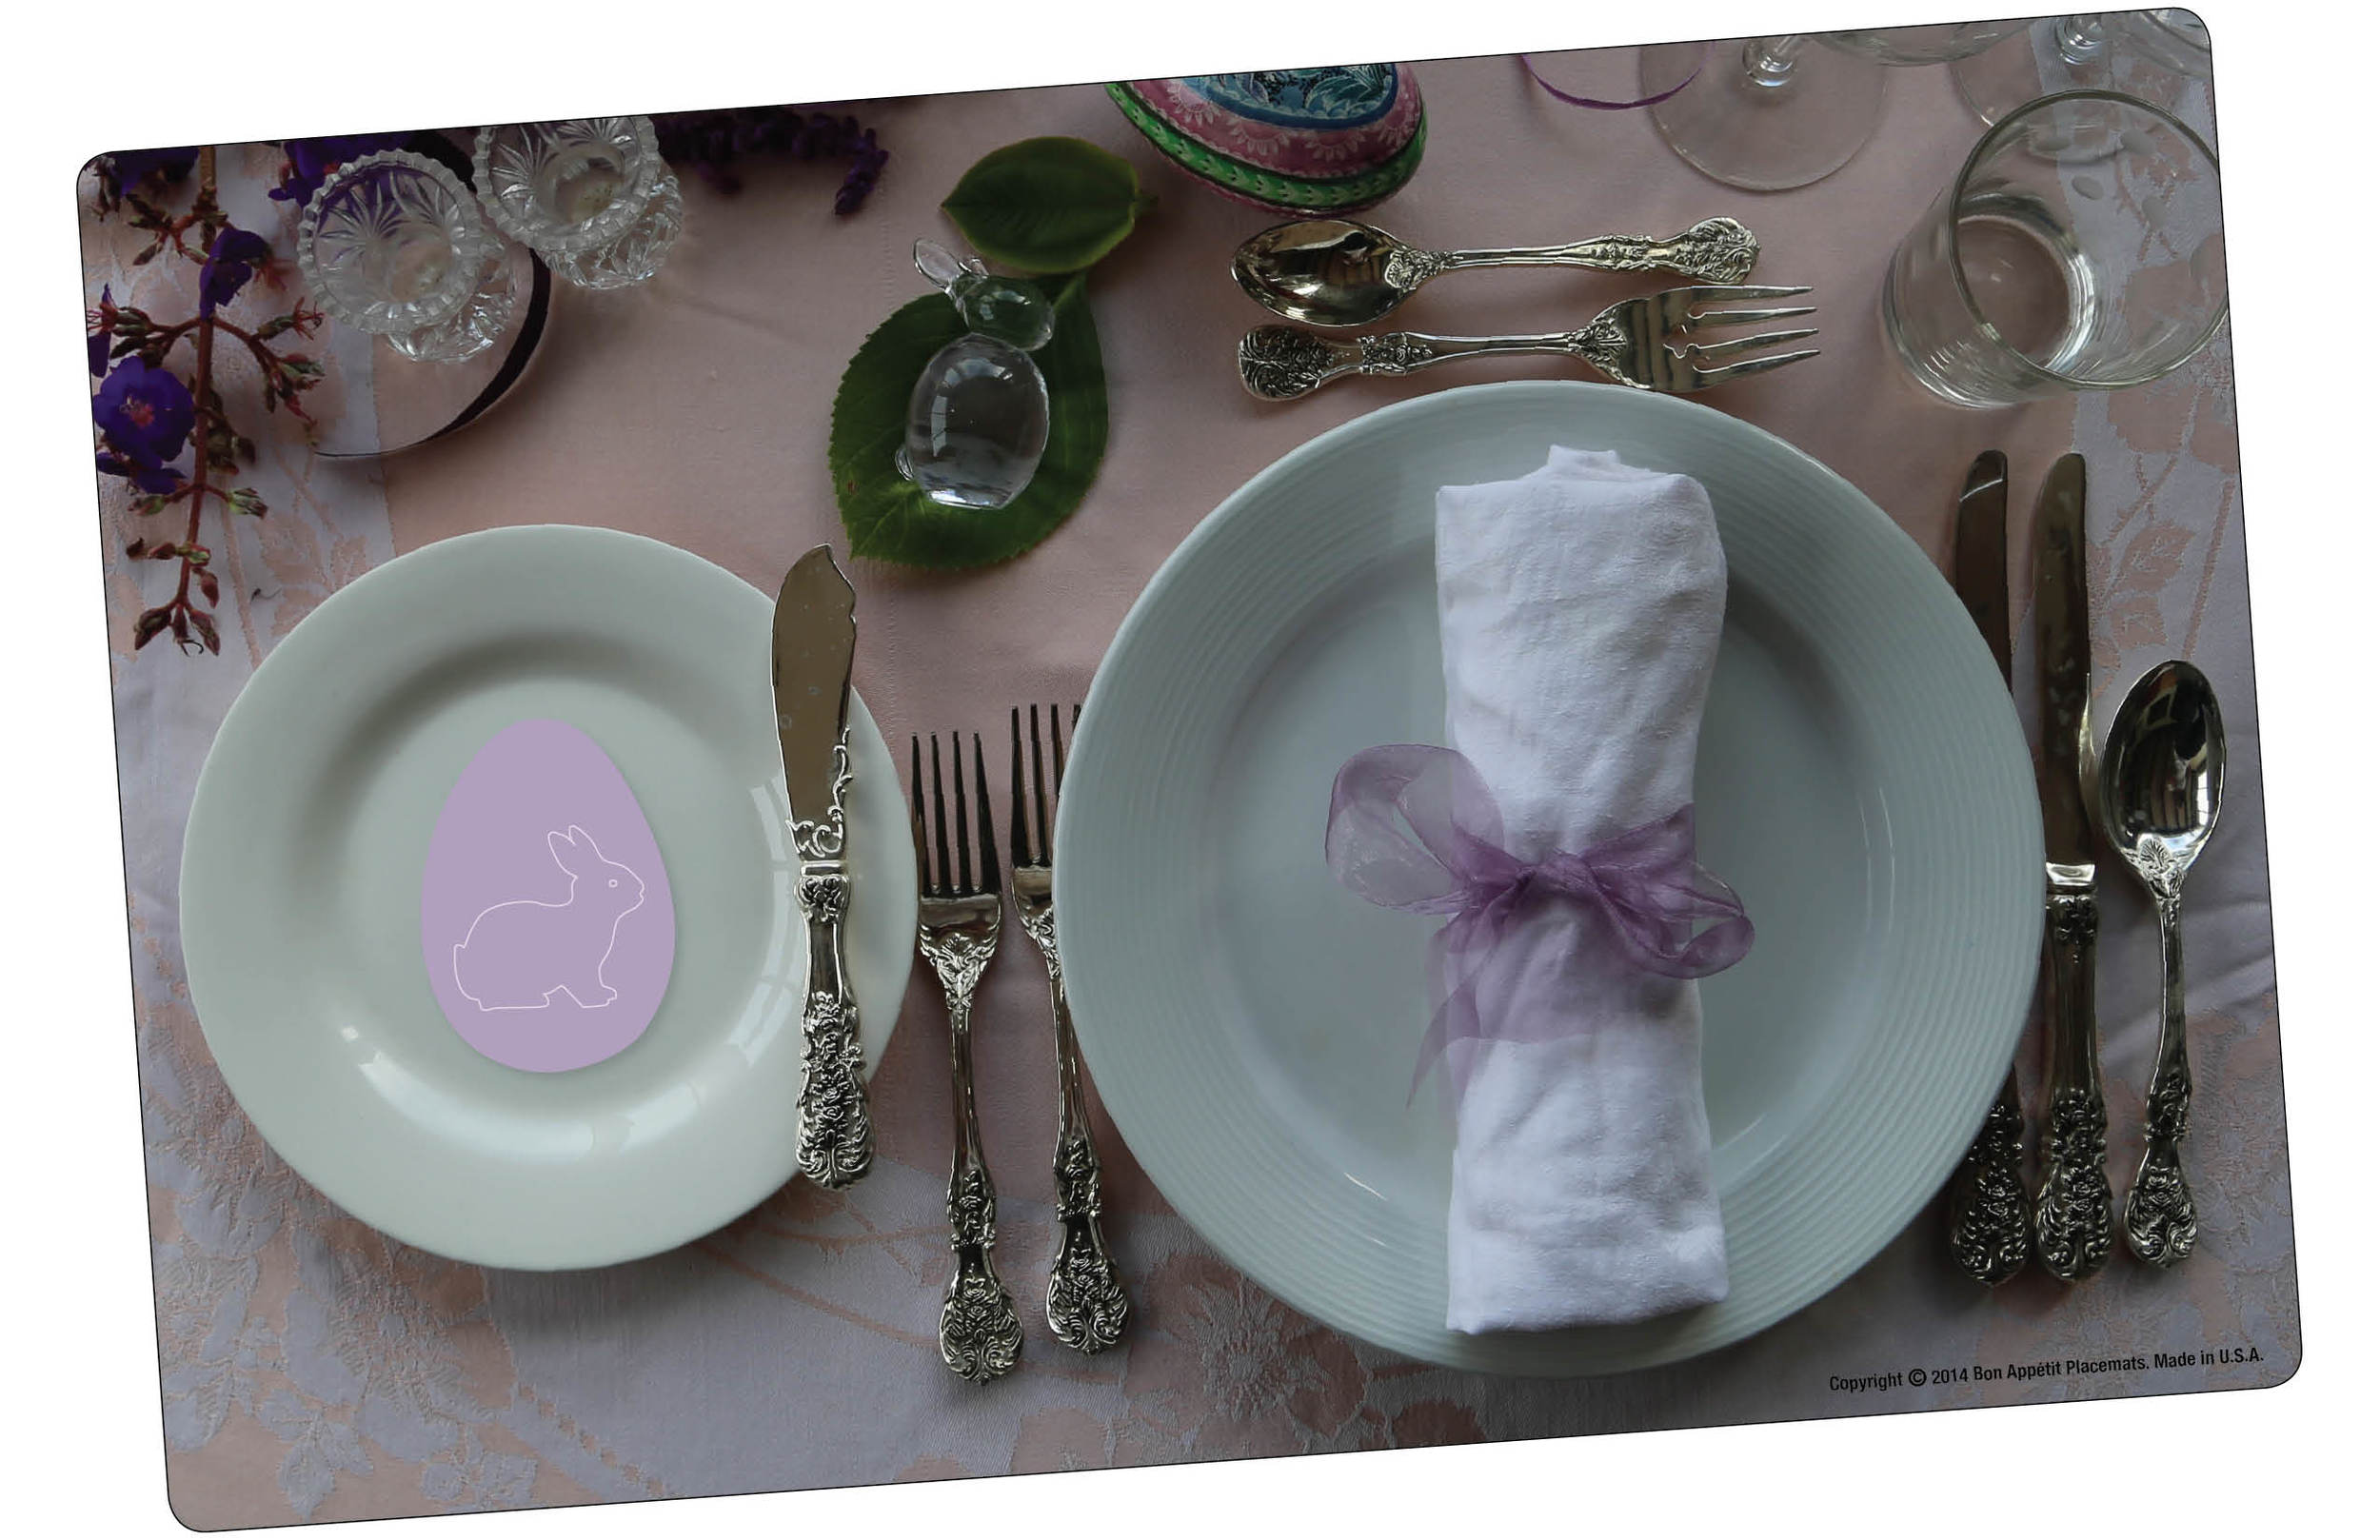 Bon Appetit Placemat Easter.jpg